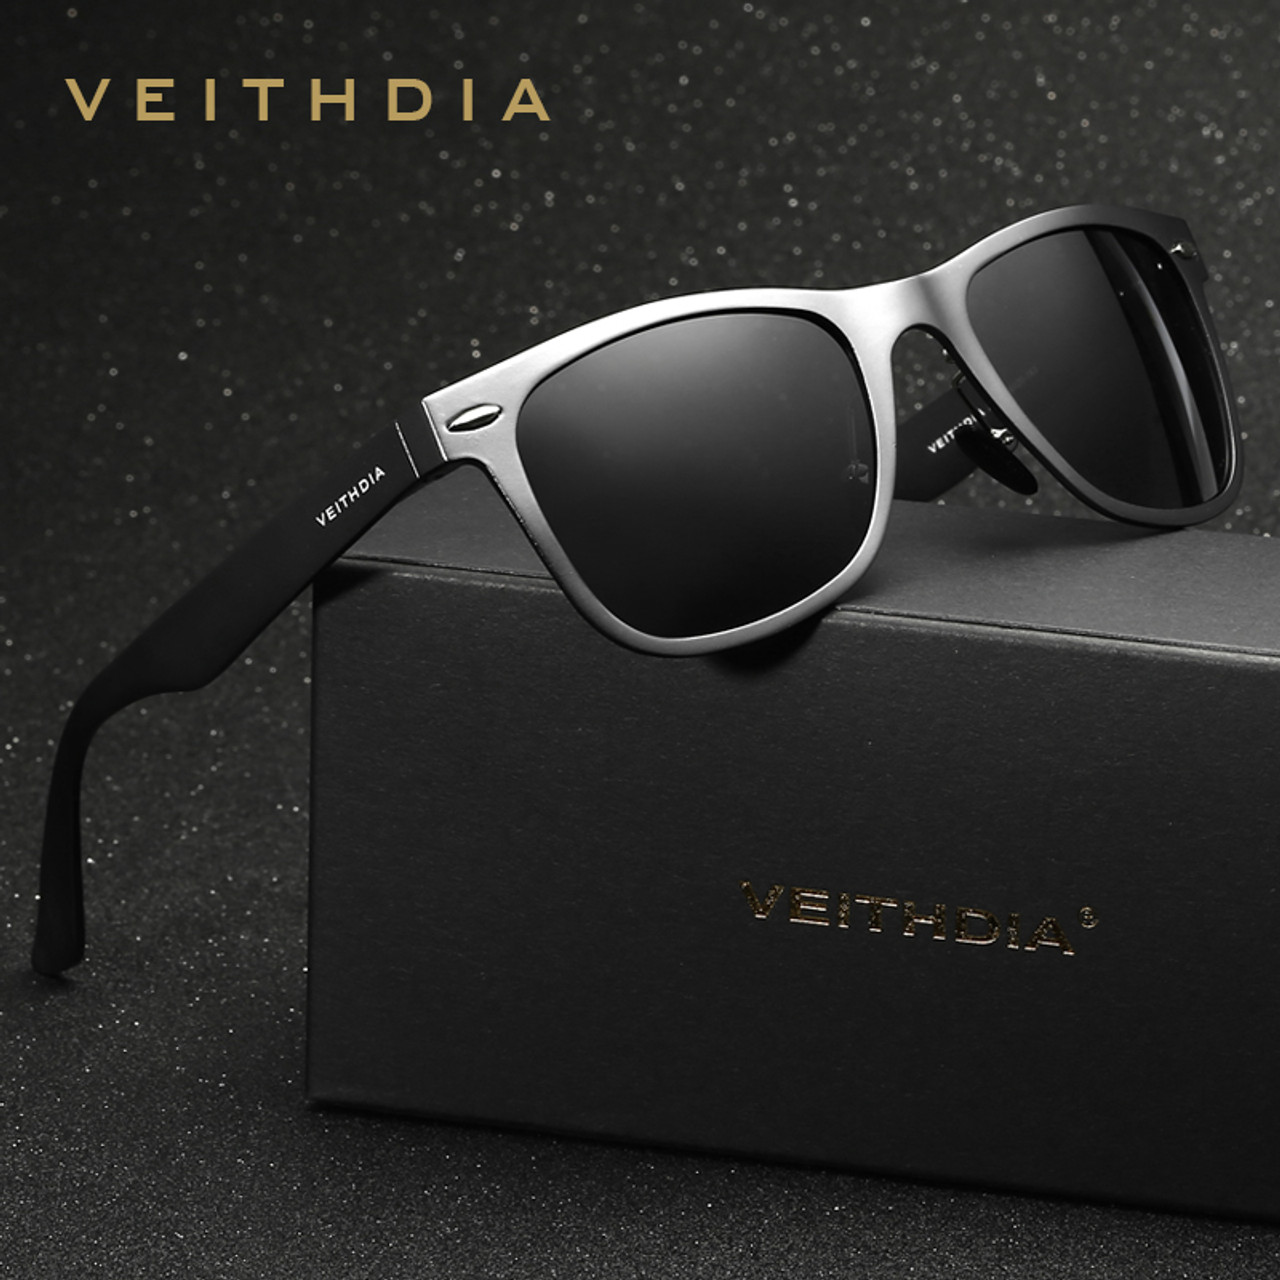 56c33ee549 VEITHDIA Brand Unisex Aluminum Square Men s Polarized Mirror Sun Glasses  Female Eyewears Accessories Sunglasses For Men VT2140 - OnshopDeals.Com